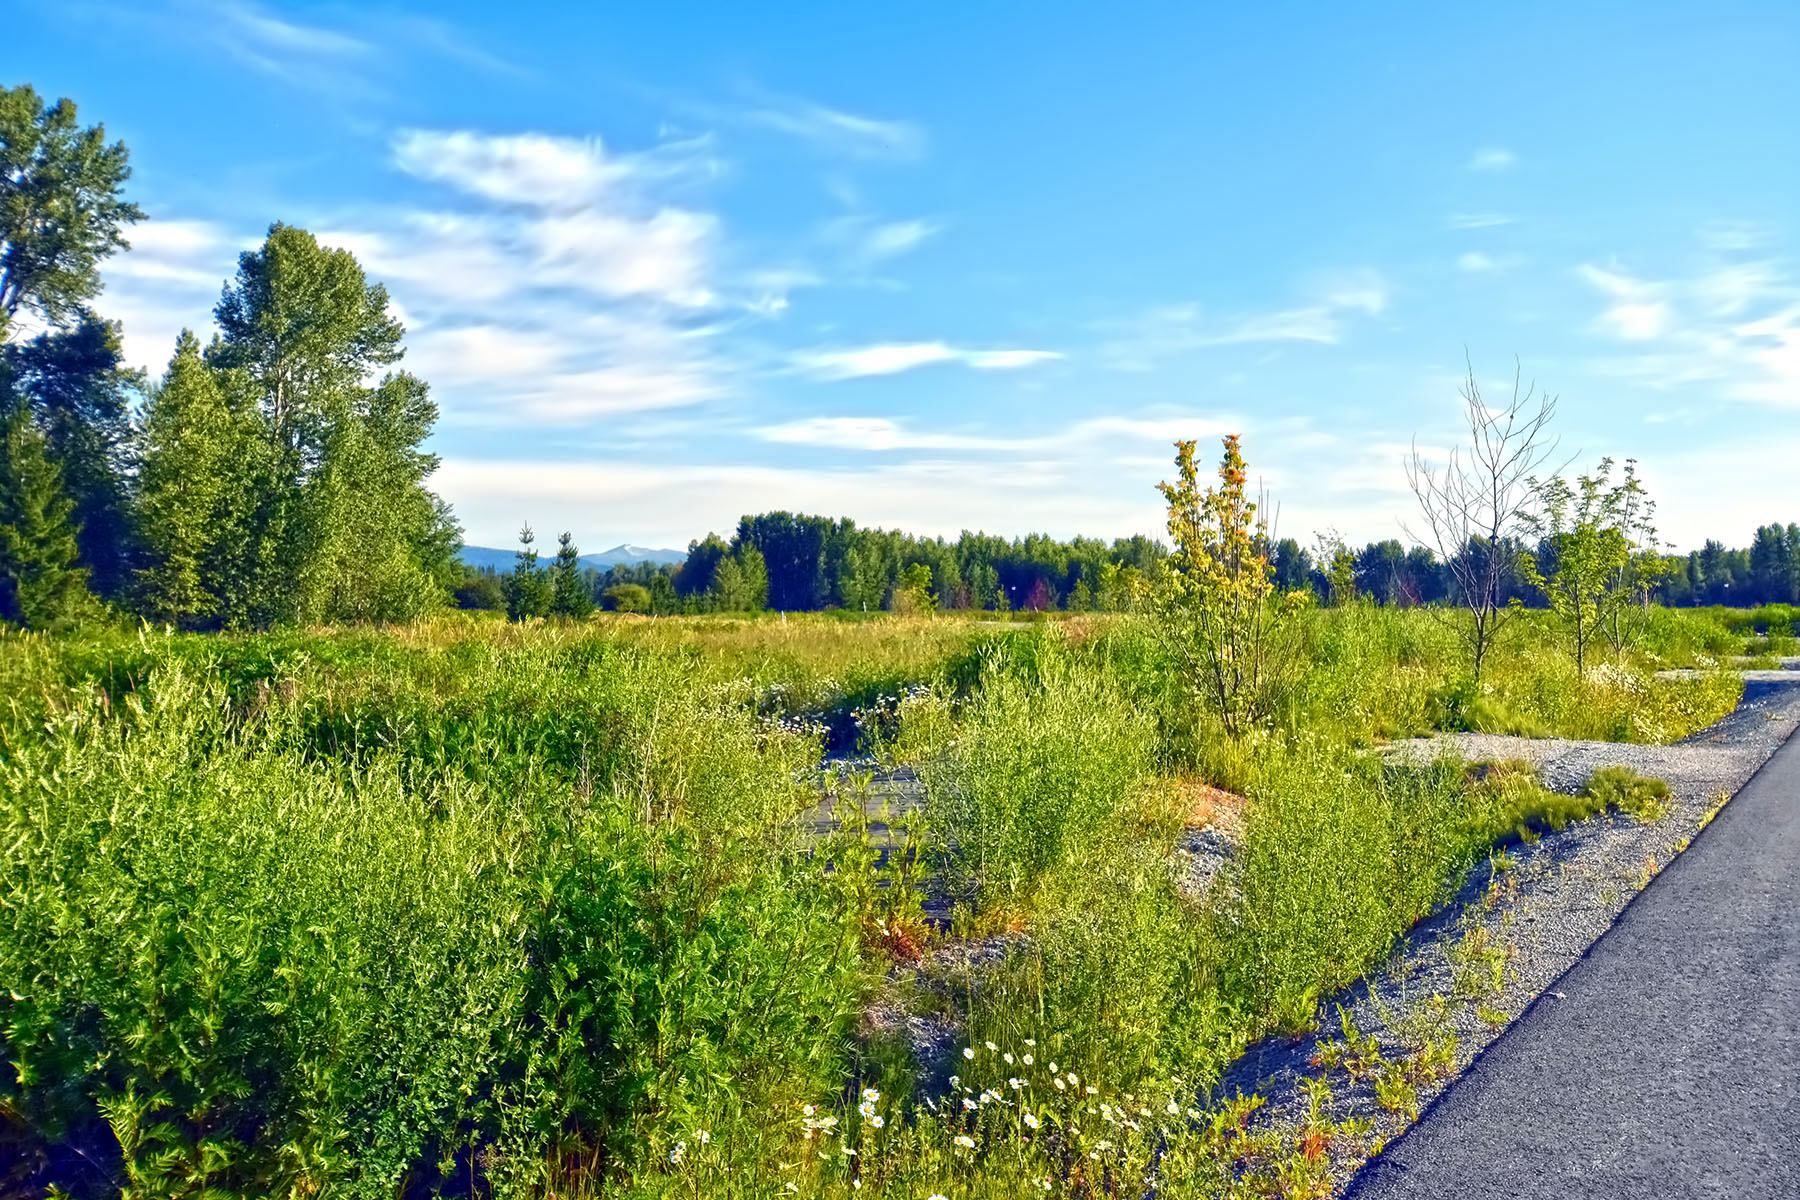 Đất đai vì Bán tại Seven Sisters Building Lots 128 Kuskanook Loop Kootenai, Idaho, 83840 Hoa Kỳ